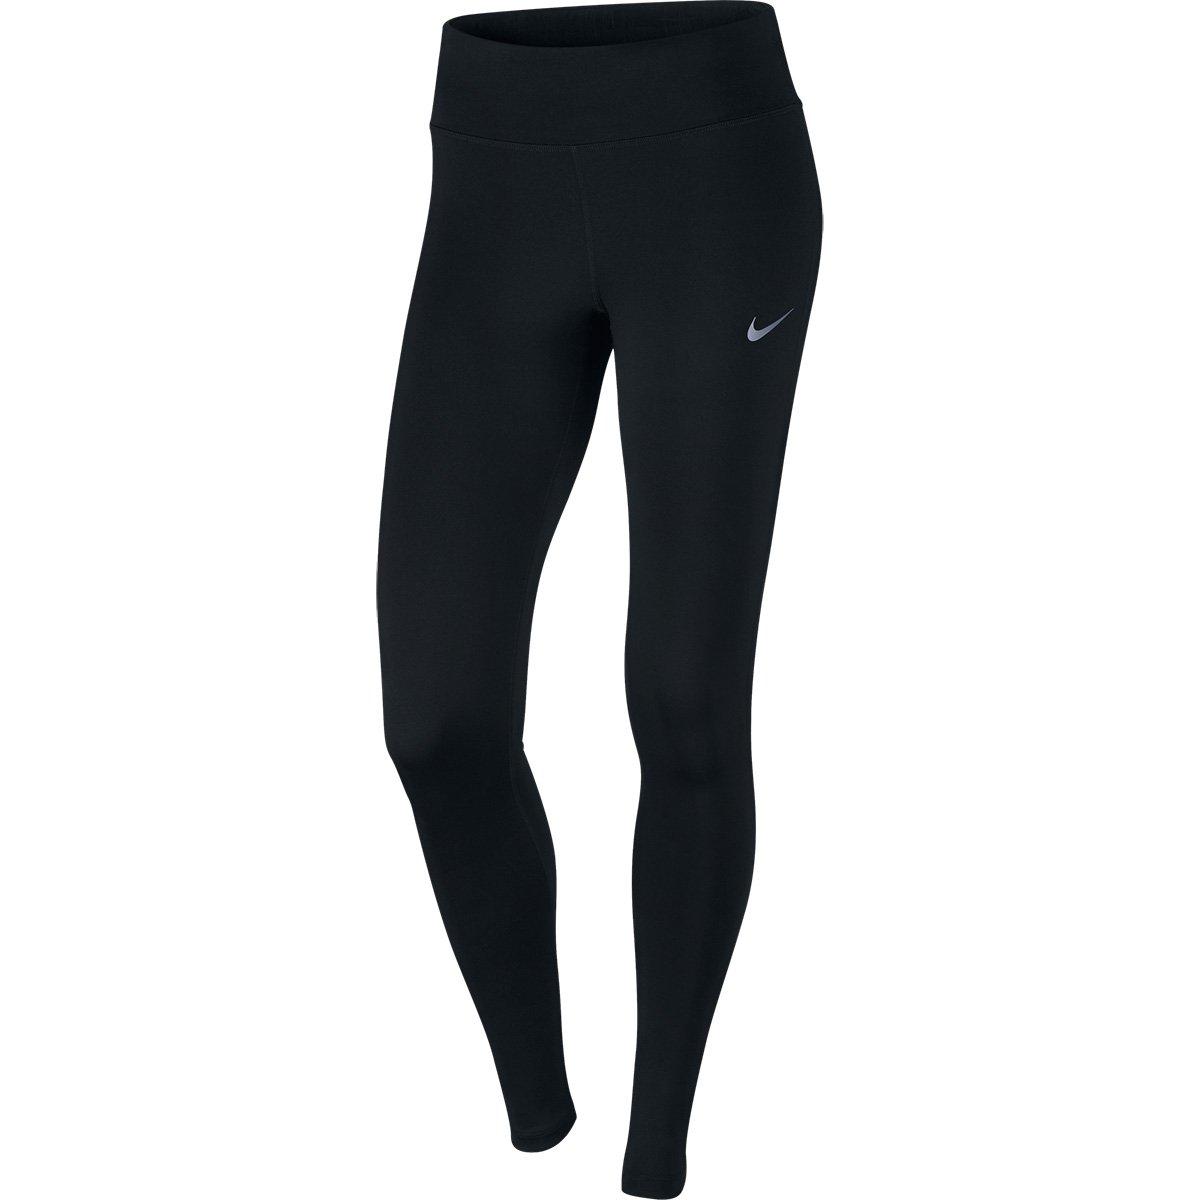 8cdf8e1641 Calça Legging Nike Dri-FIT Power Essential Feminina